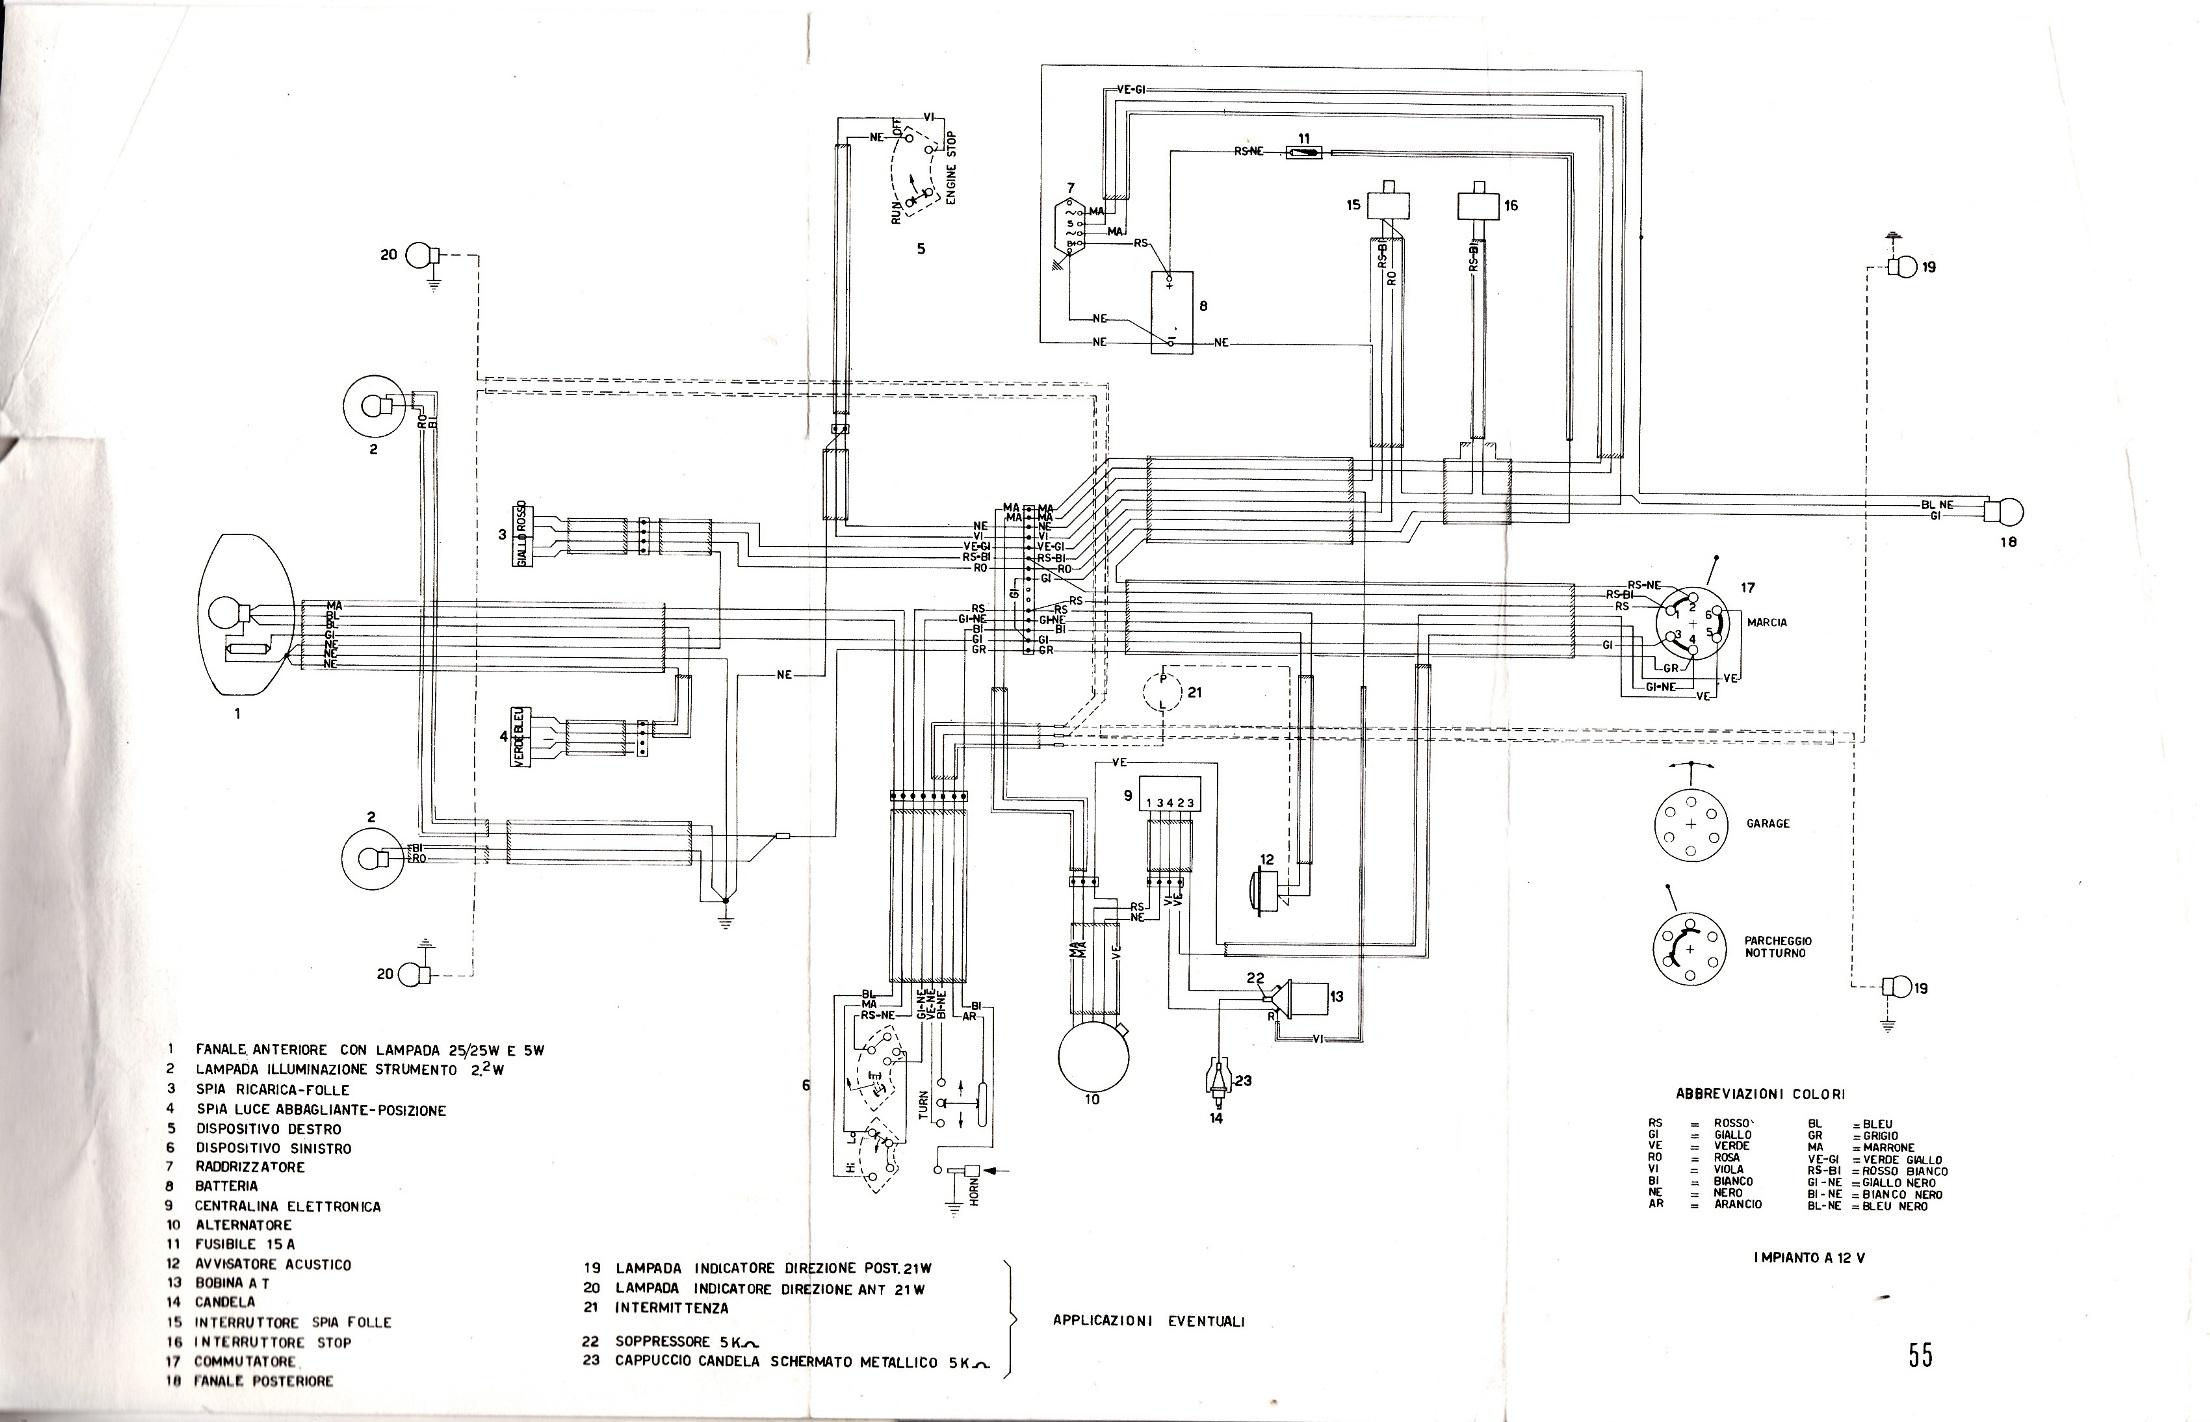 wanted: 125 sport wiring diagram | MV Agusta Forum | Mv Agusta Brutale Wiring Diagram |  | MVAgusta.net